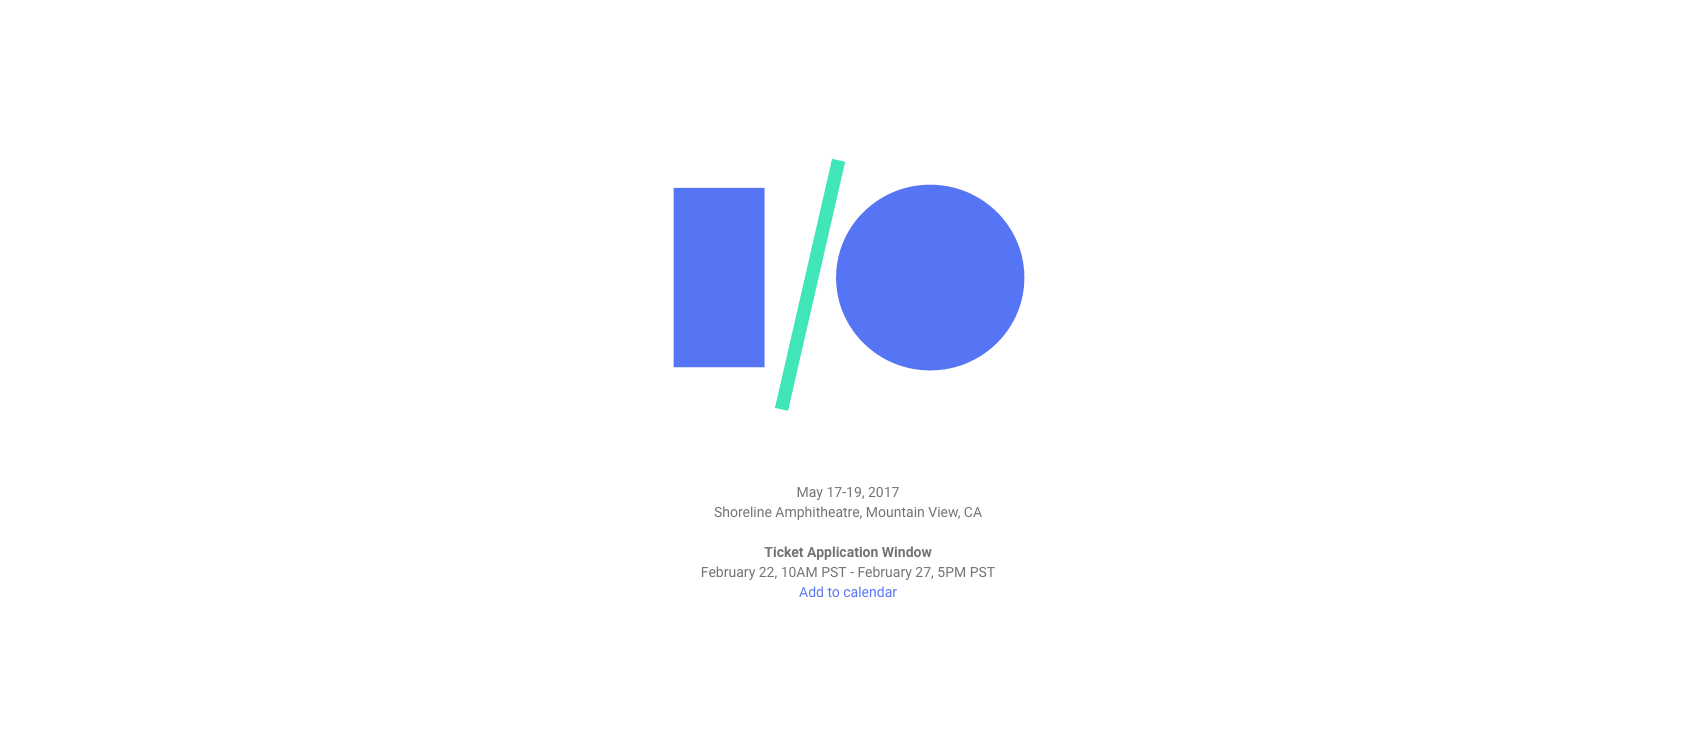 google-io-2017-2017-02-09-14-50-24